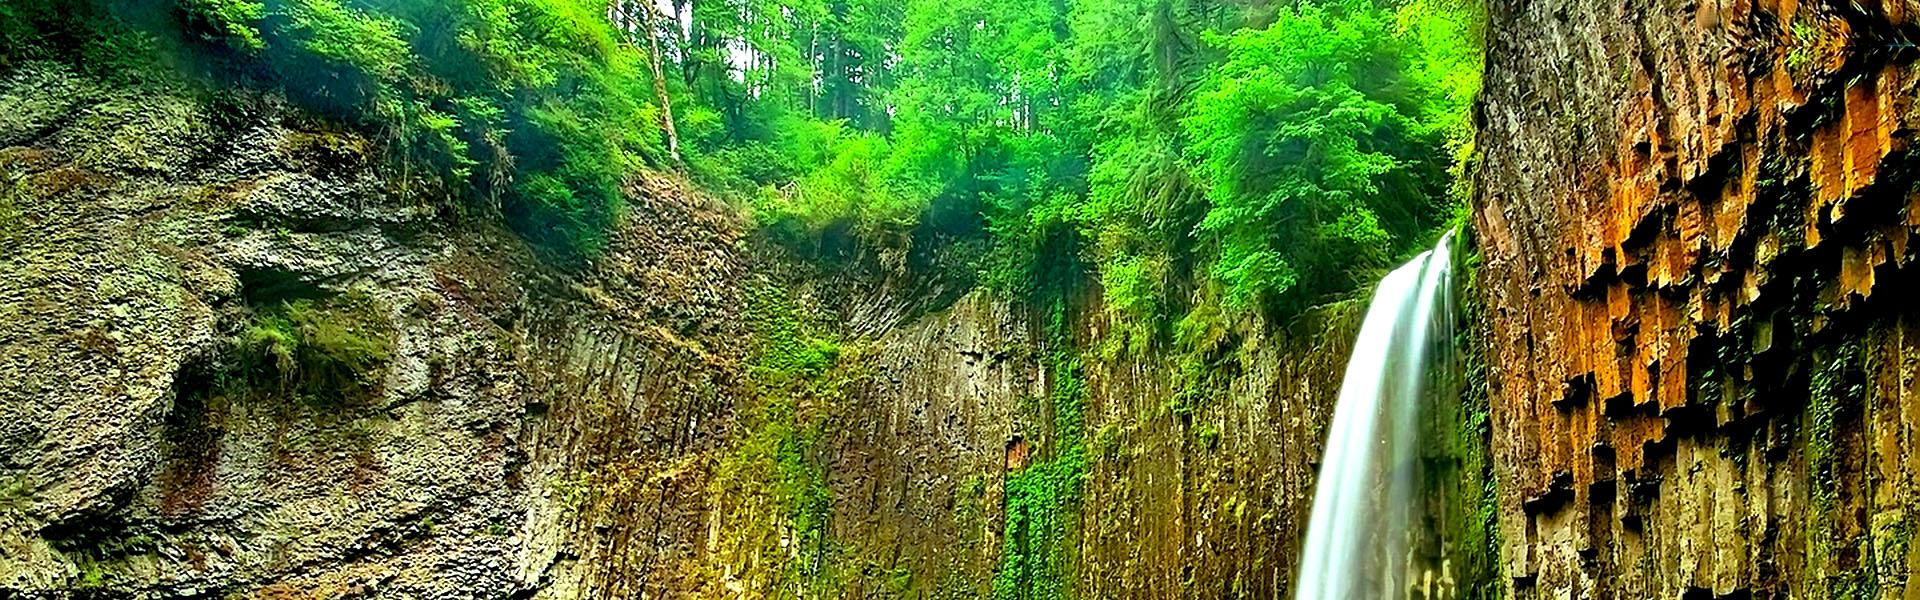 slider-cascada-verd